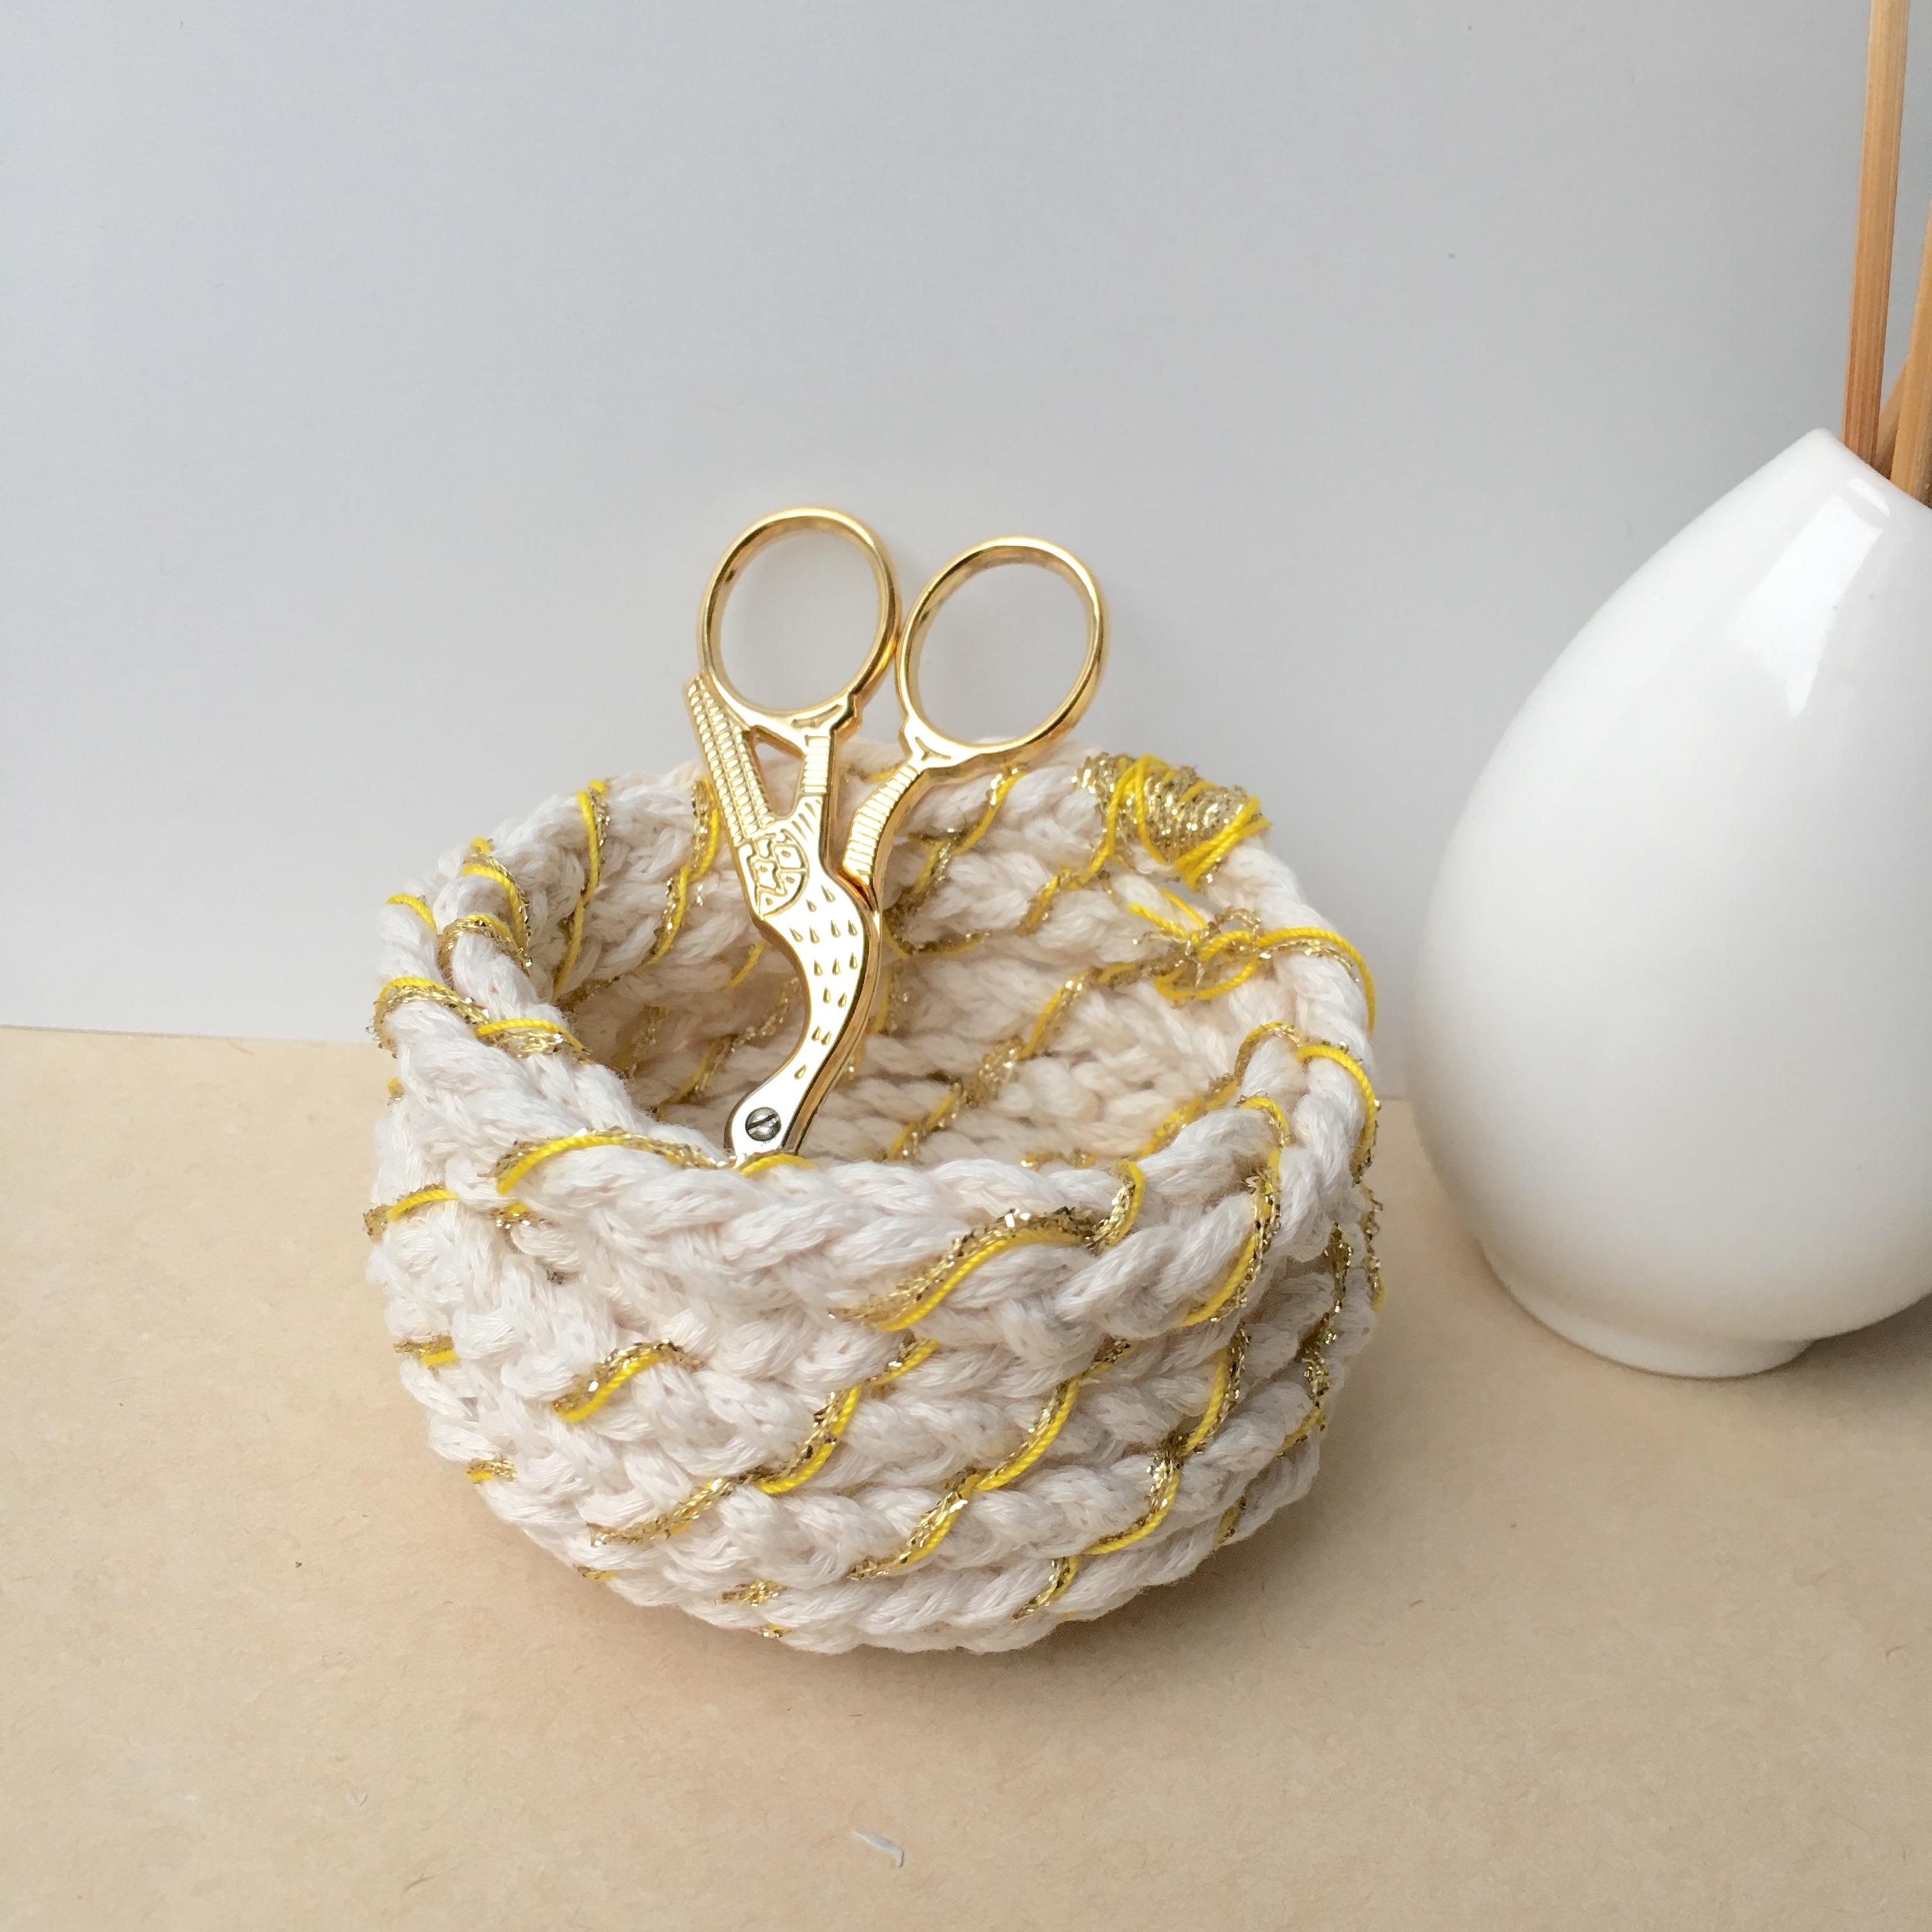 Panier en corde tissée